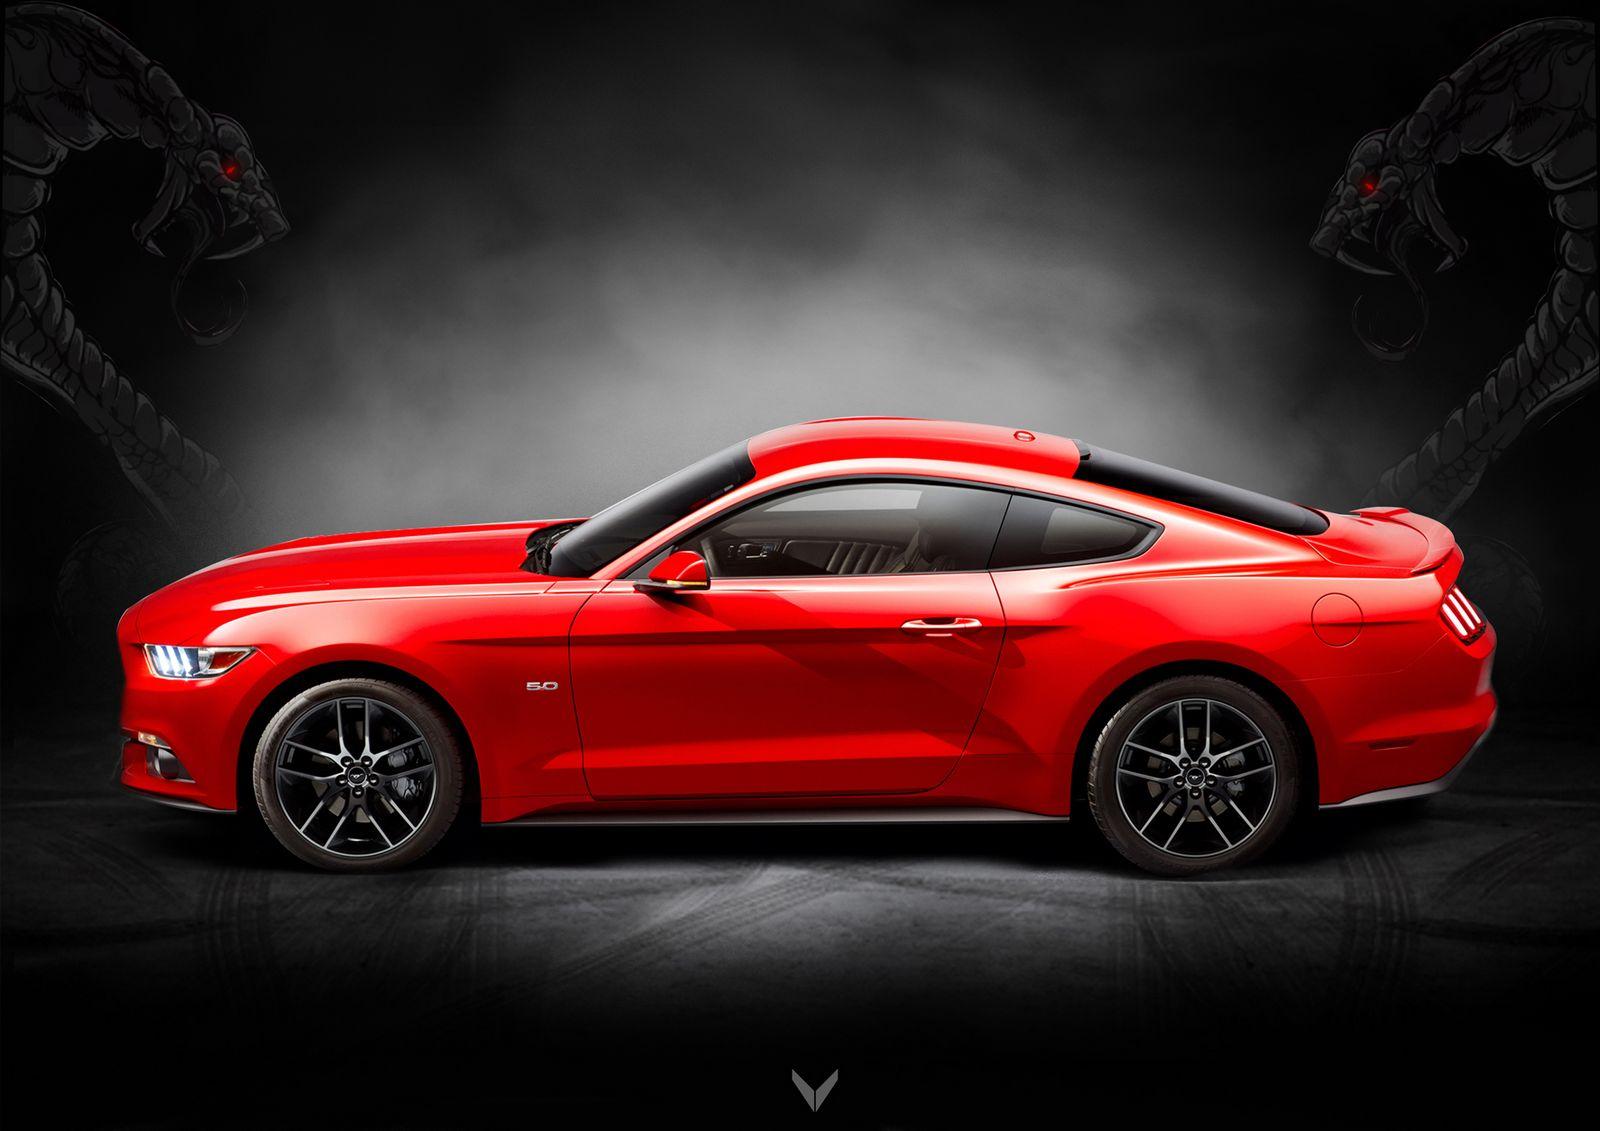 Ford Mustang GT Vilner